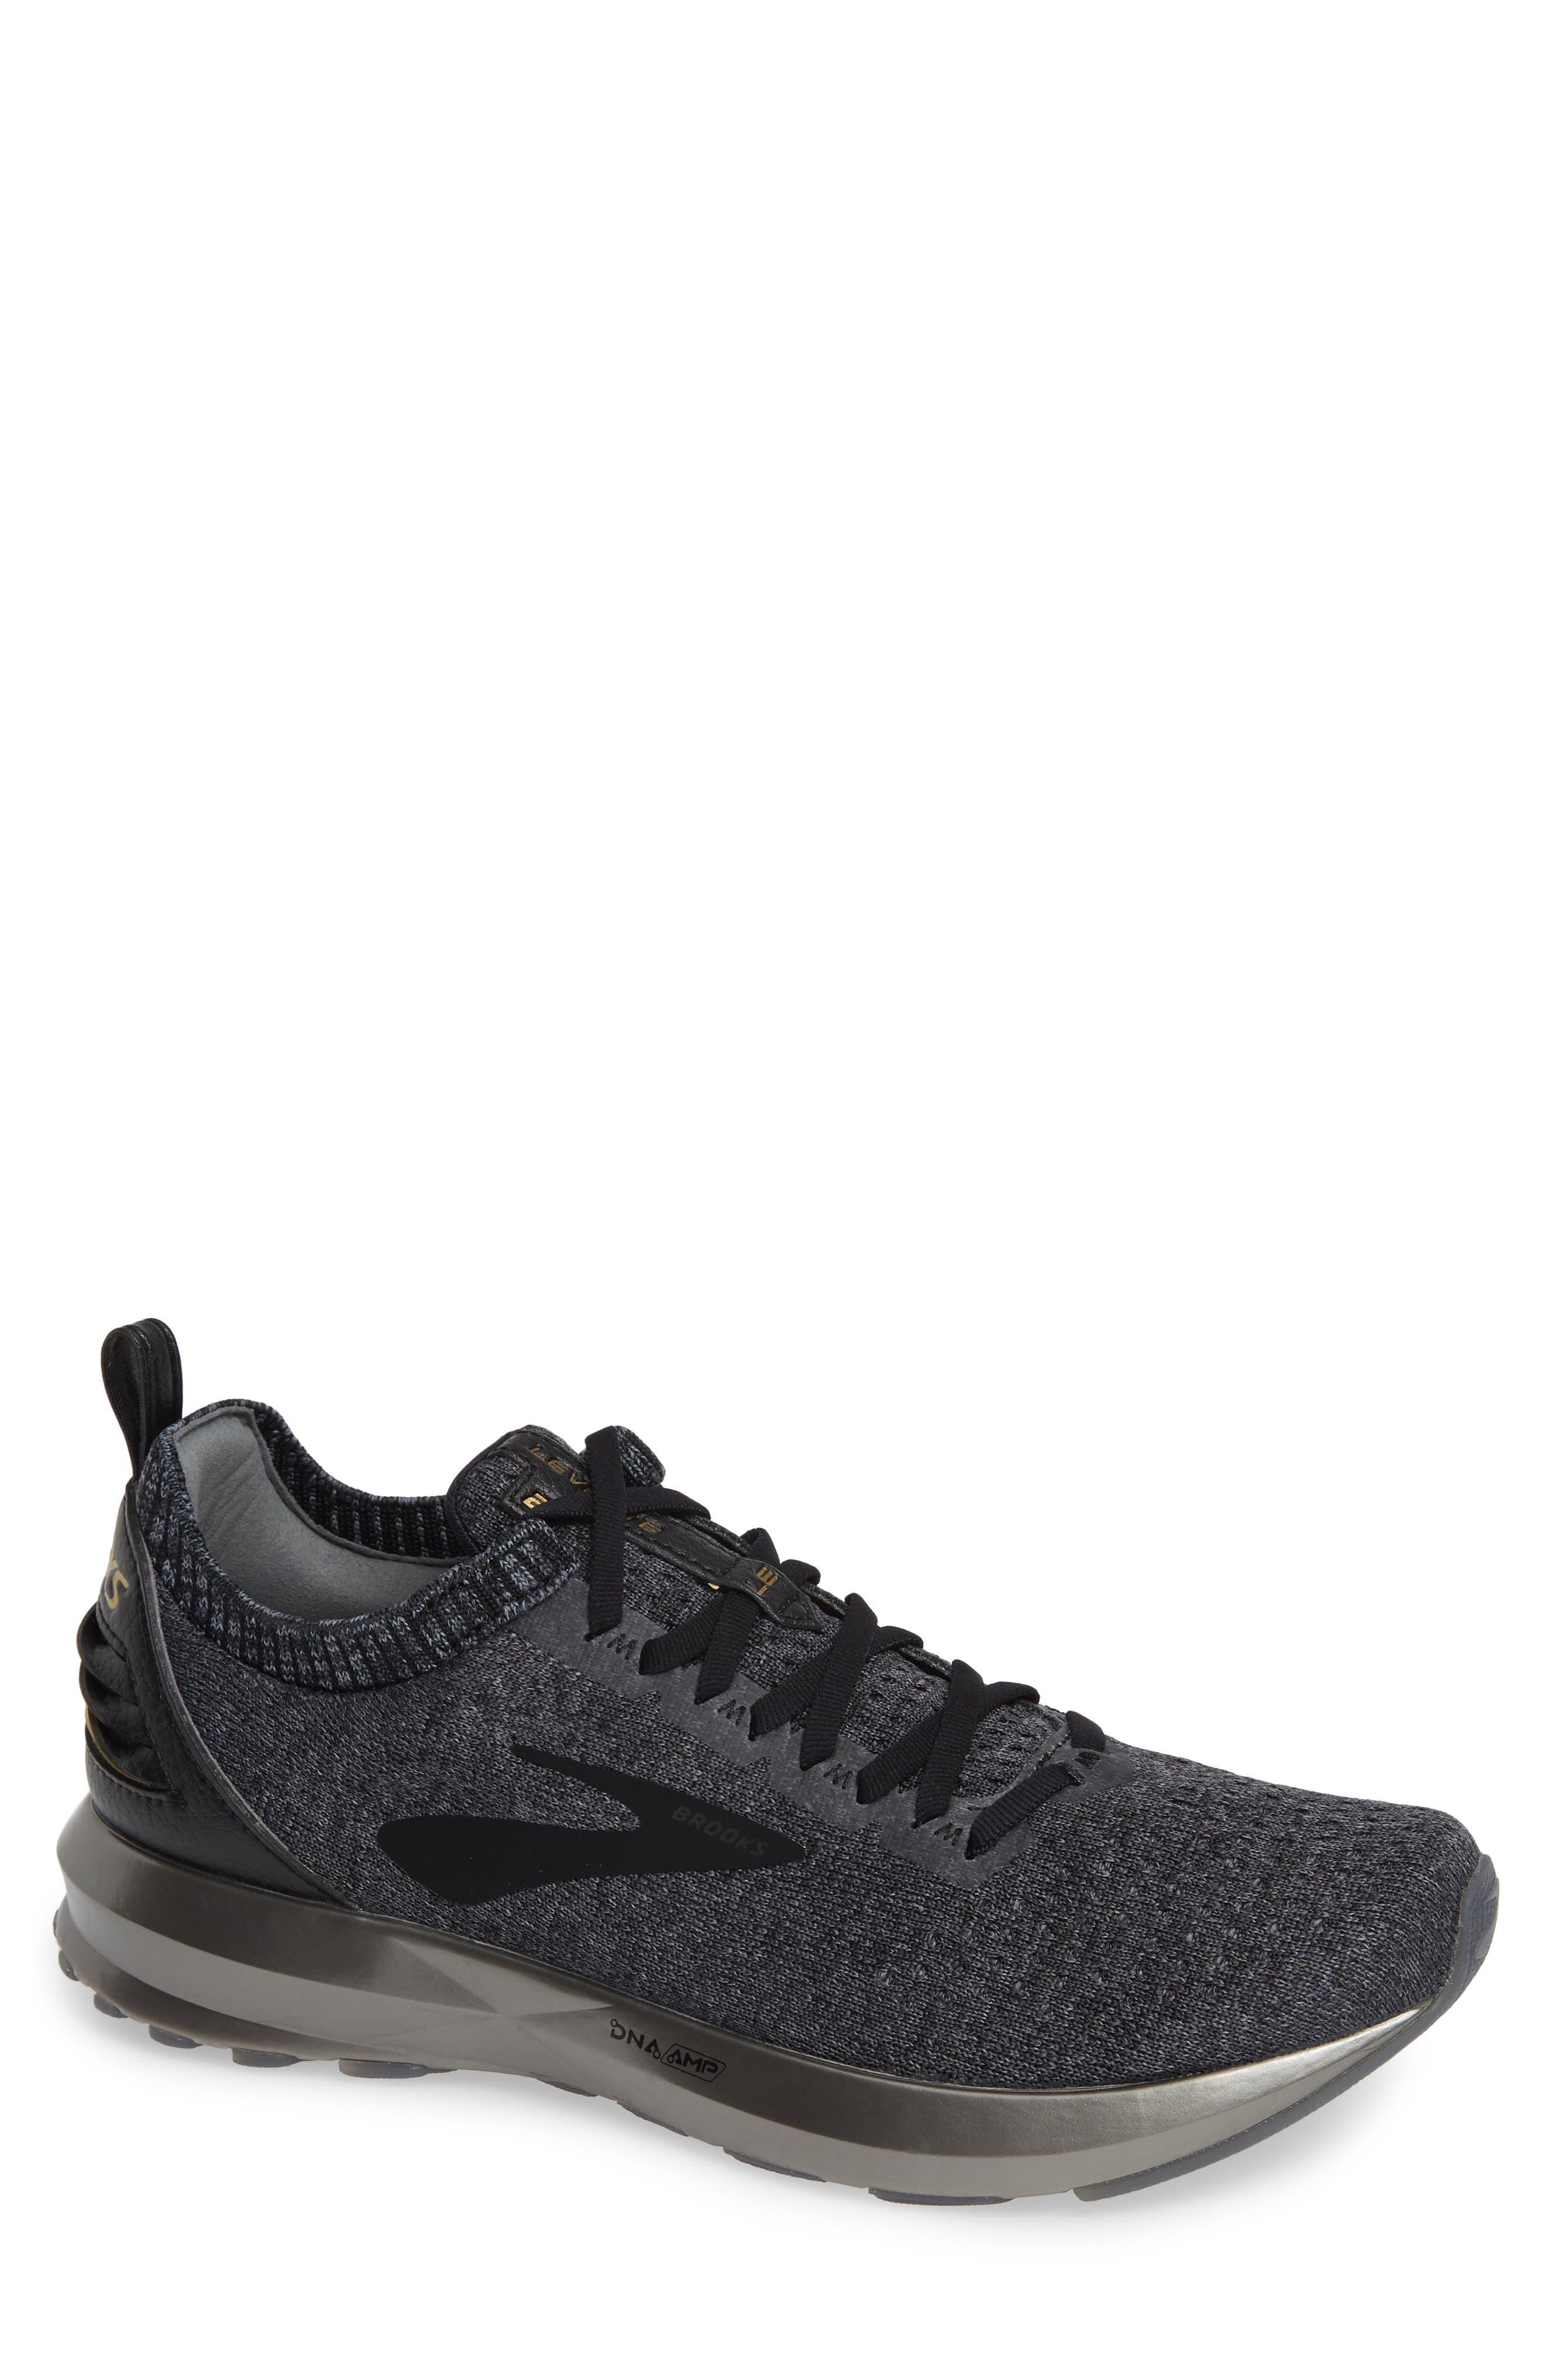 Brooks Levitate 2 Le Running Shoe, Black